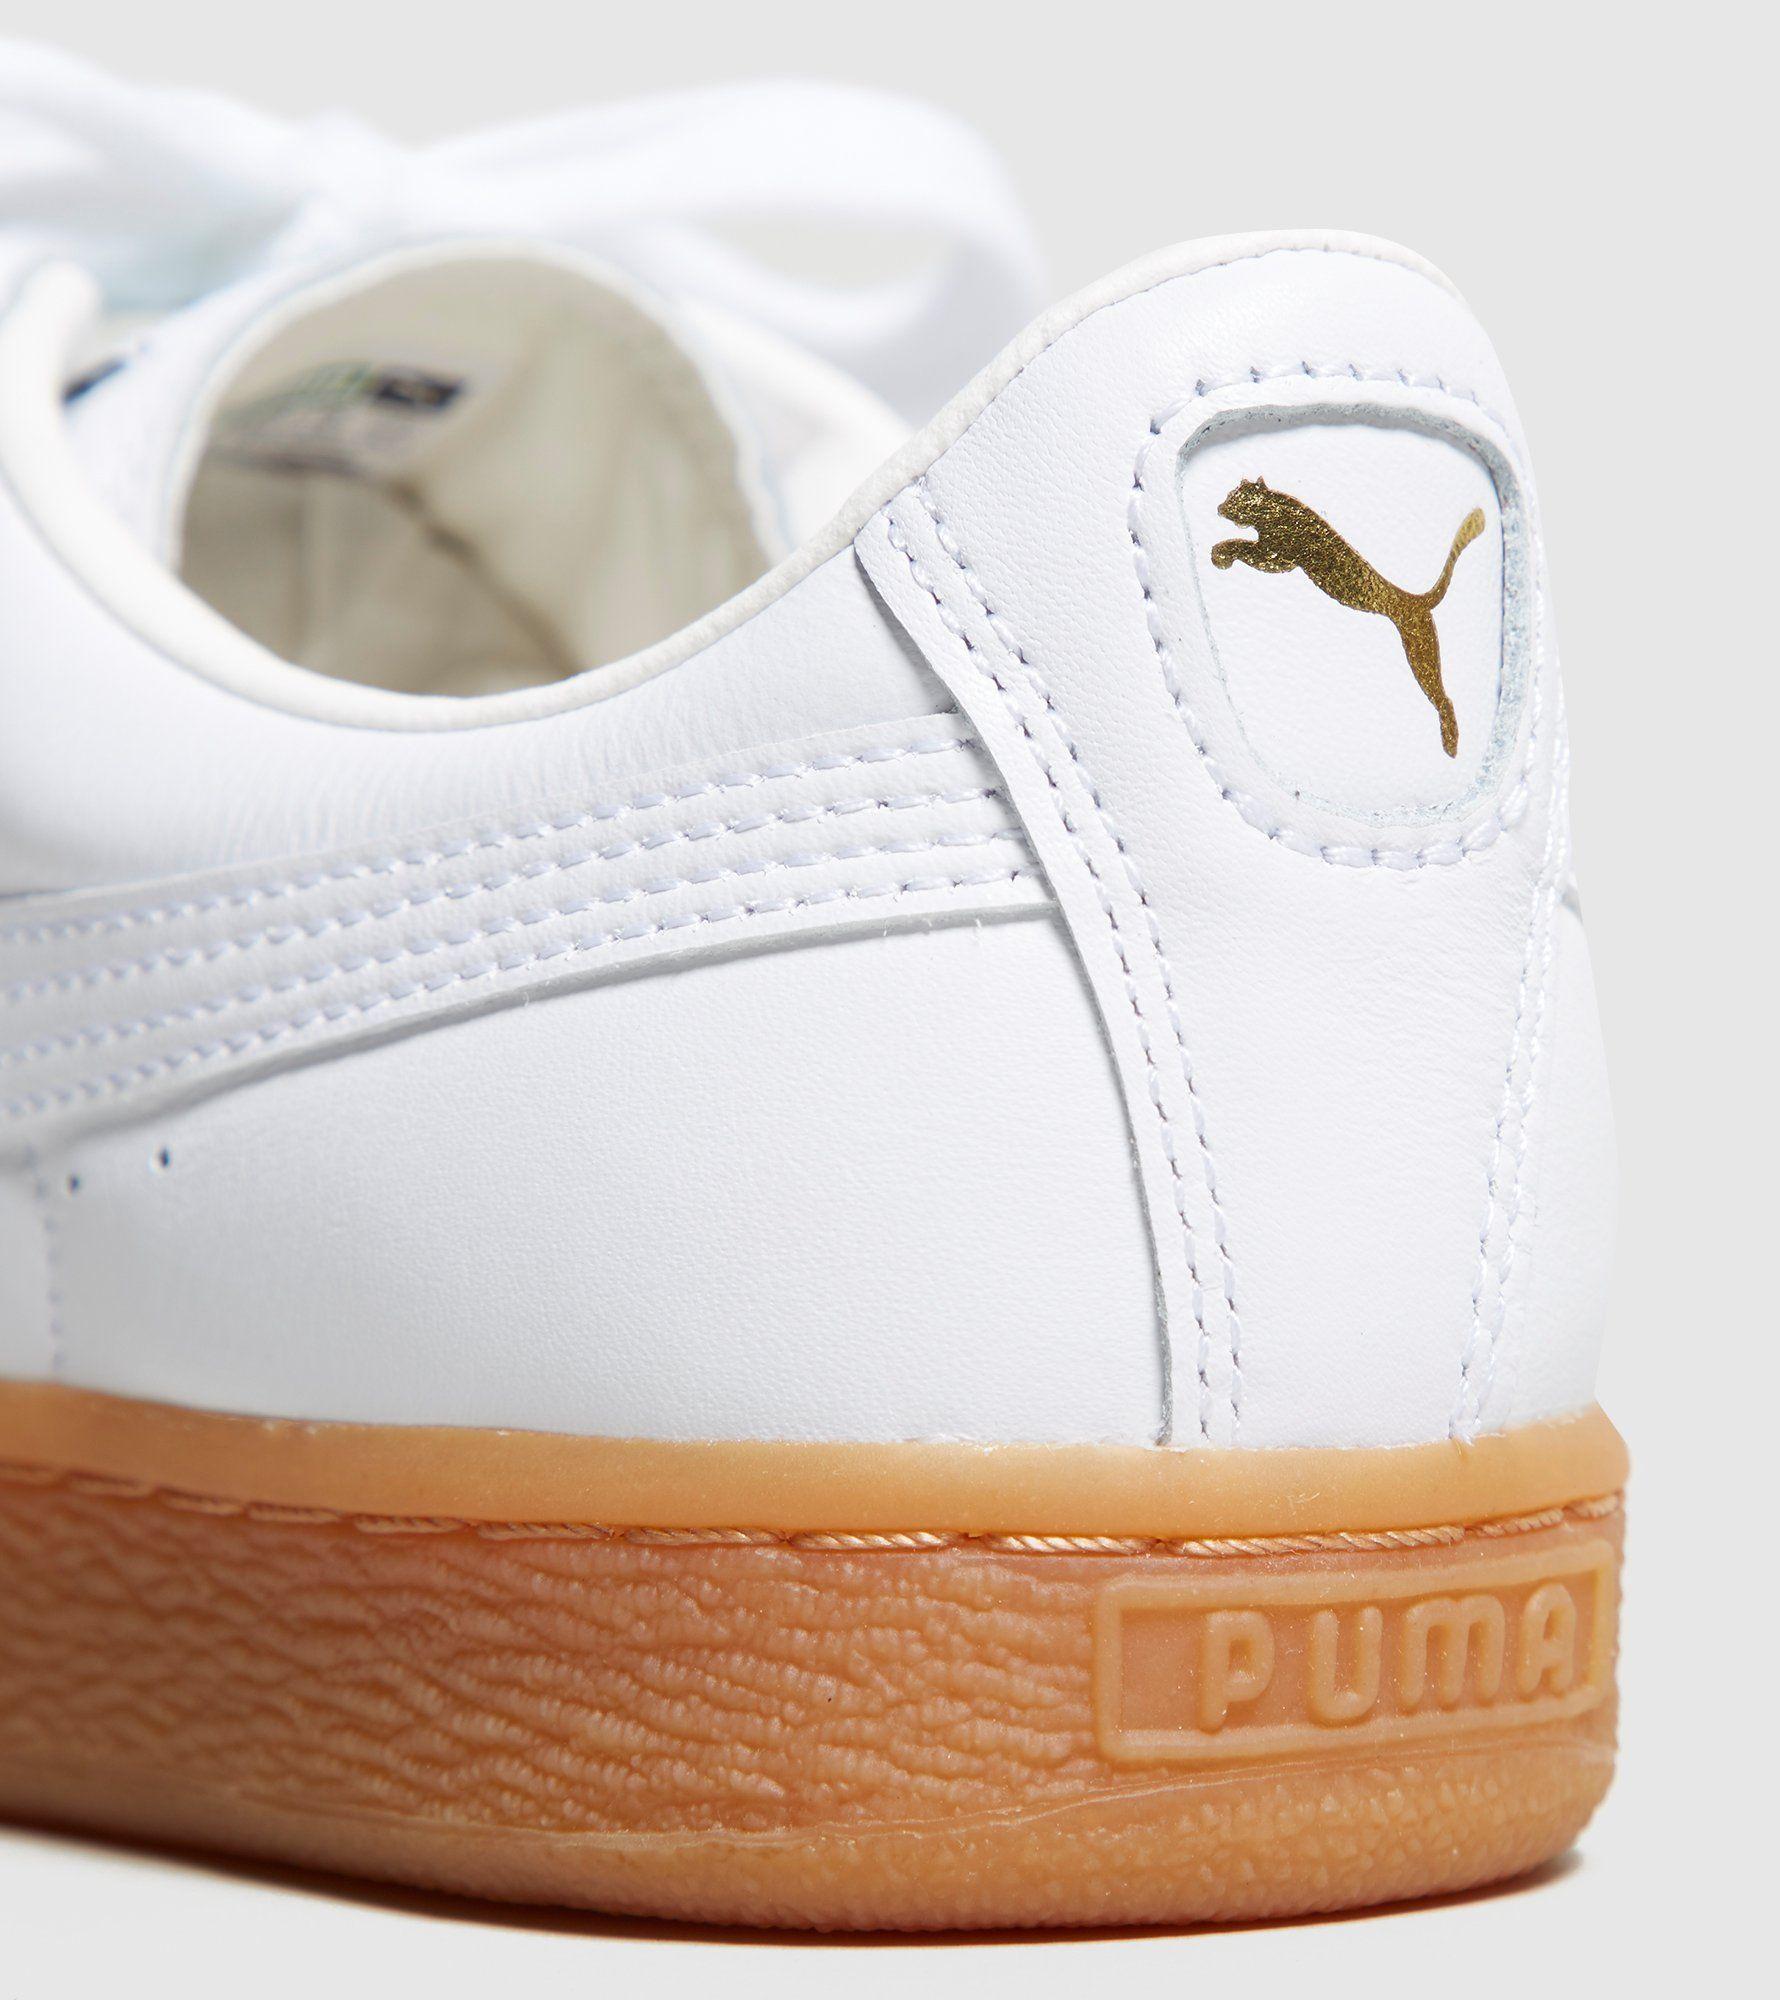 PUMA Basket Femme